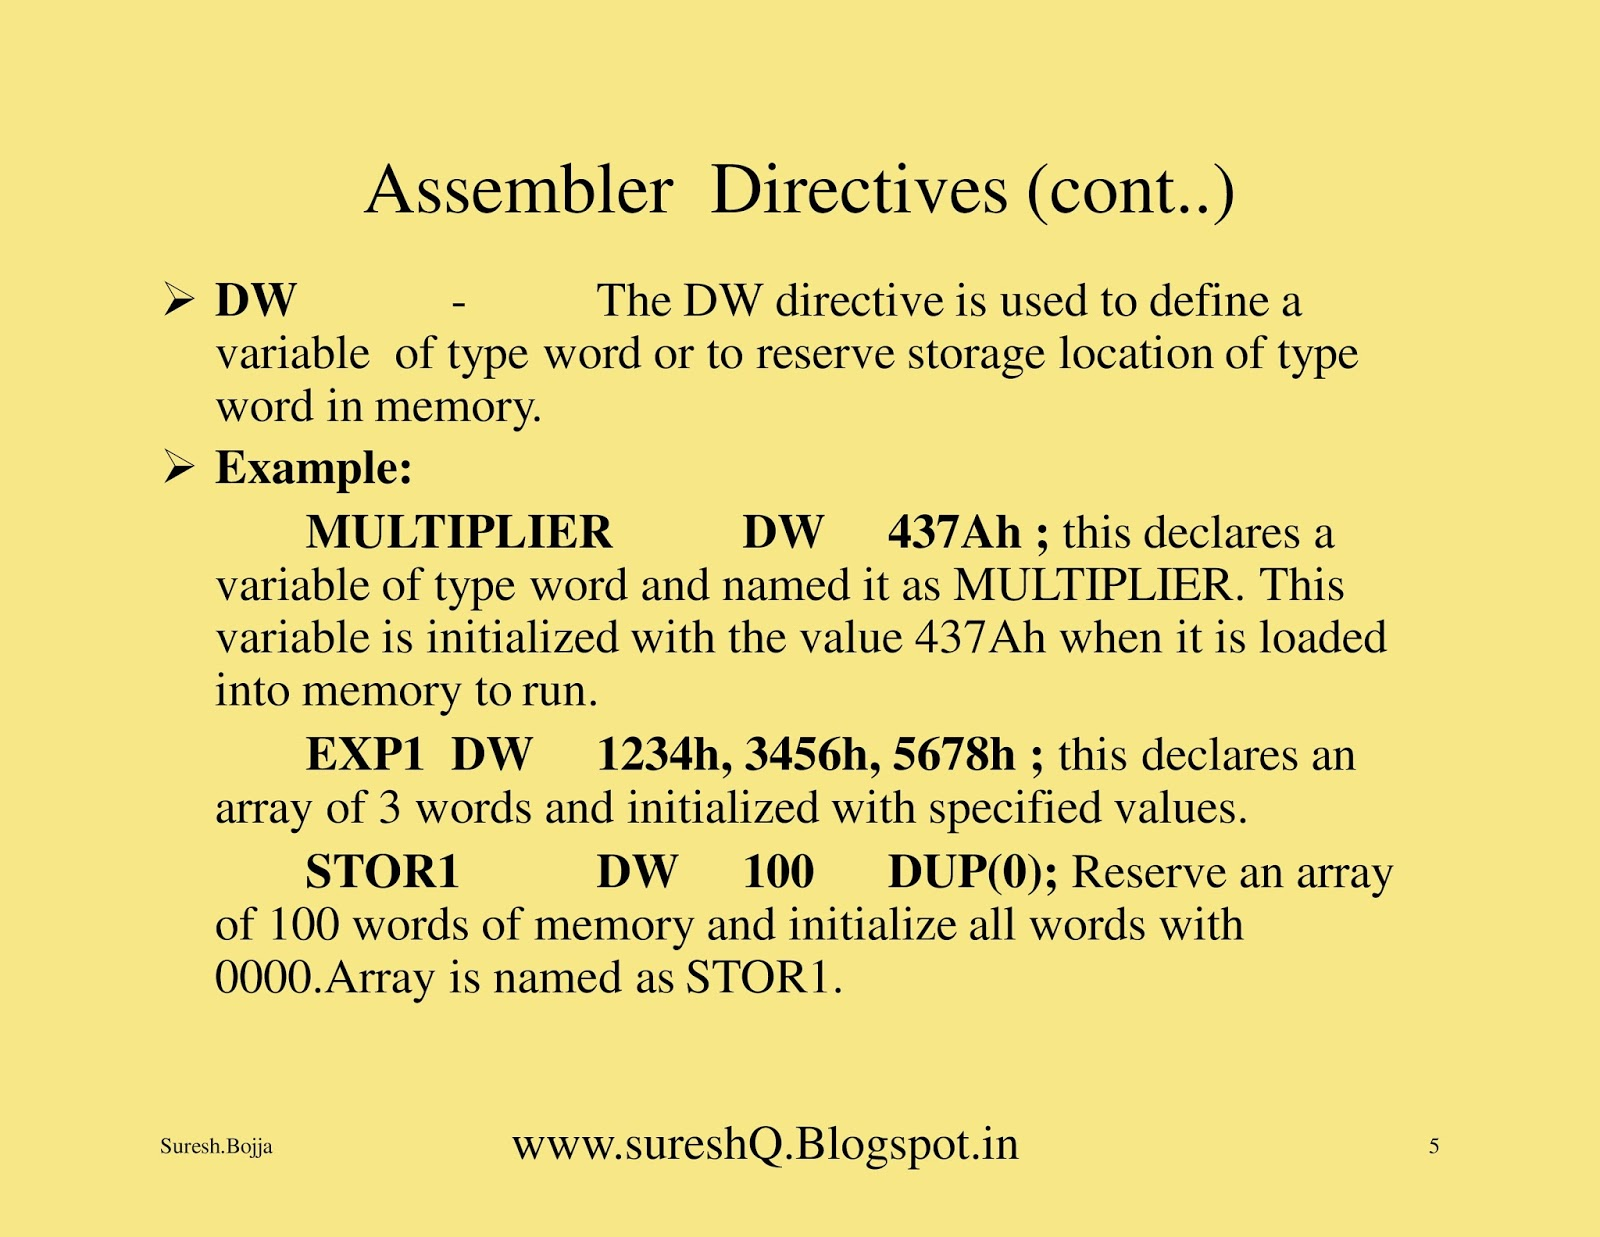 what is an assembler directive